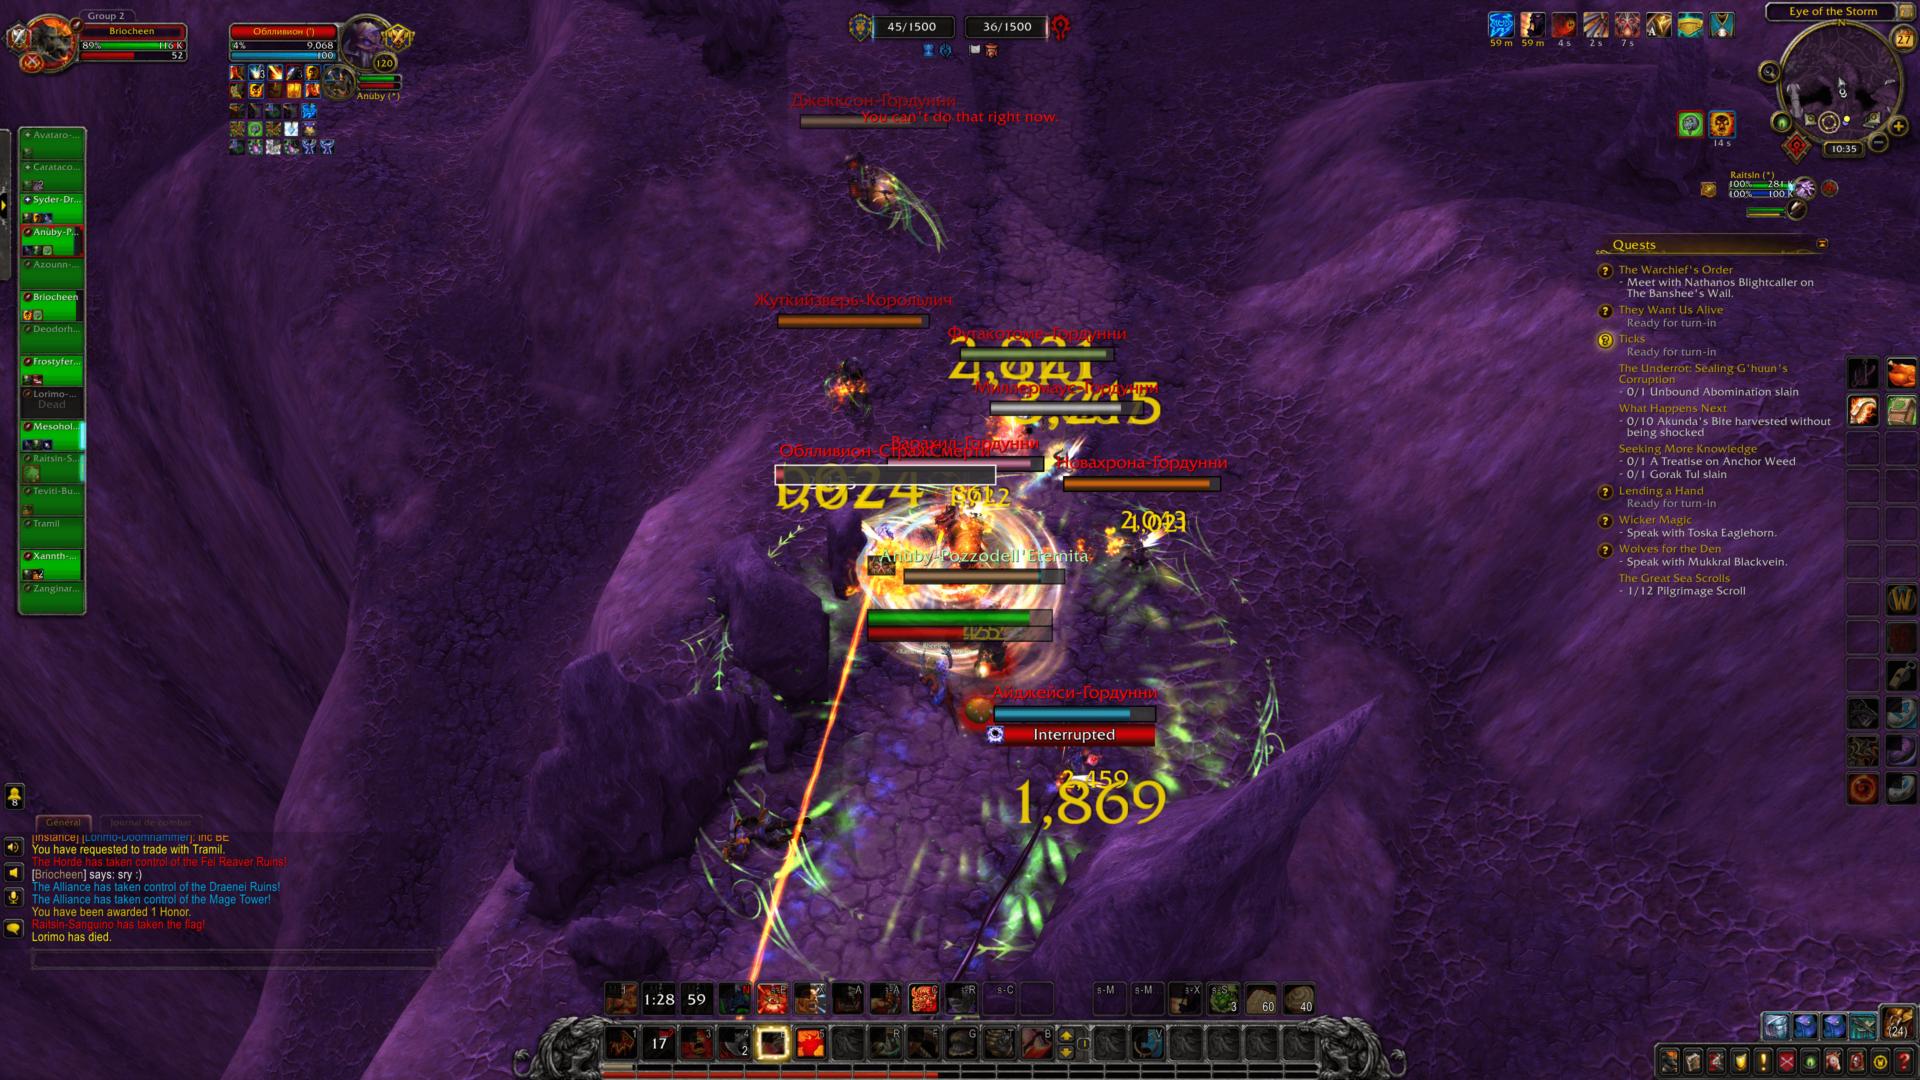 Fight screenshot of World of Warcraft video game interface.